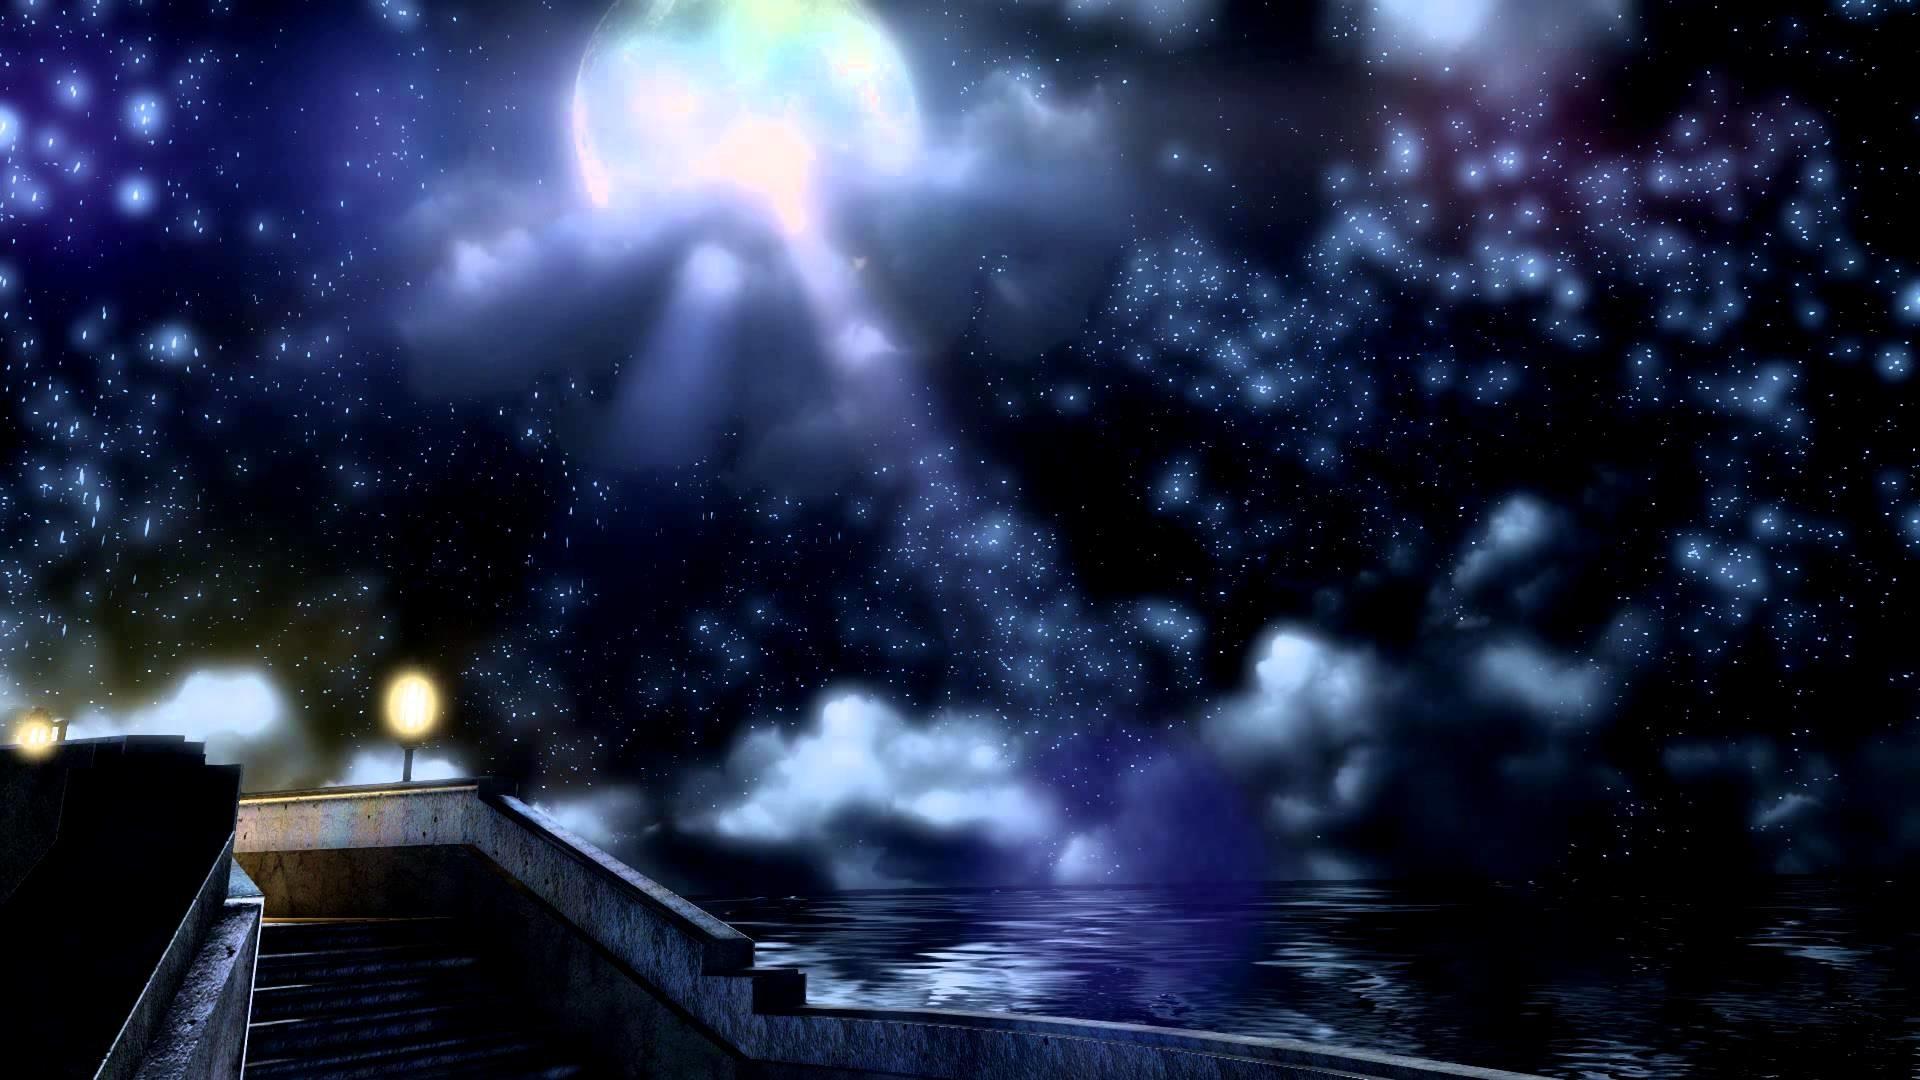 DreamScene [Live Wallpaper] – Bioshock Infinite – Moon A (1080p) –  Dual-Monitor – YouTube